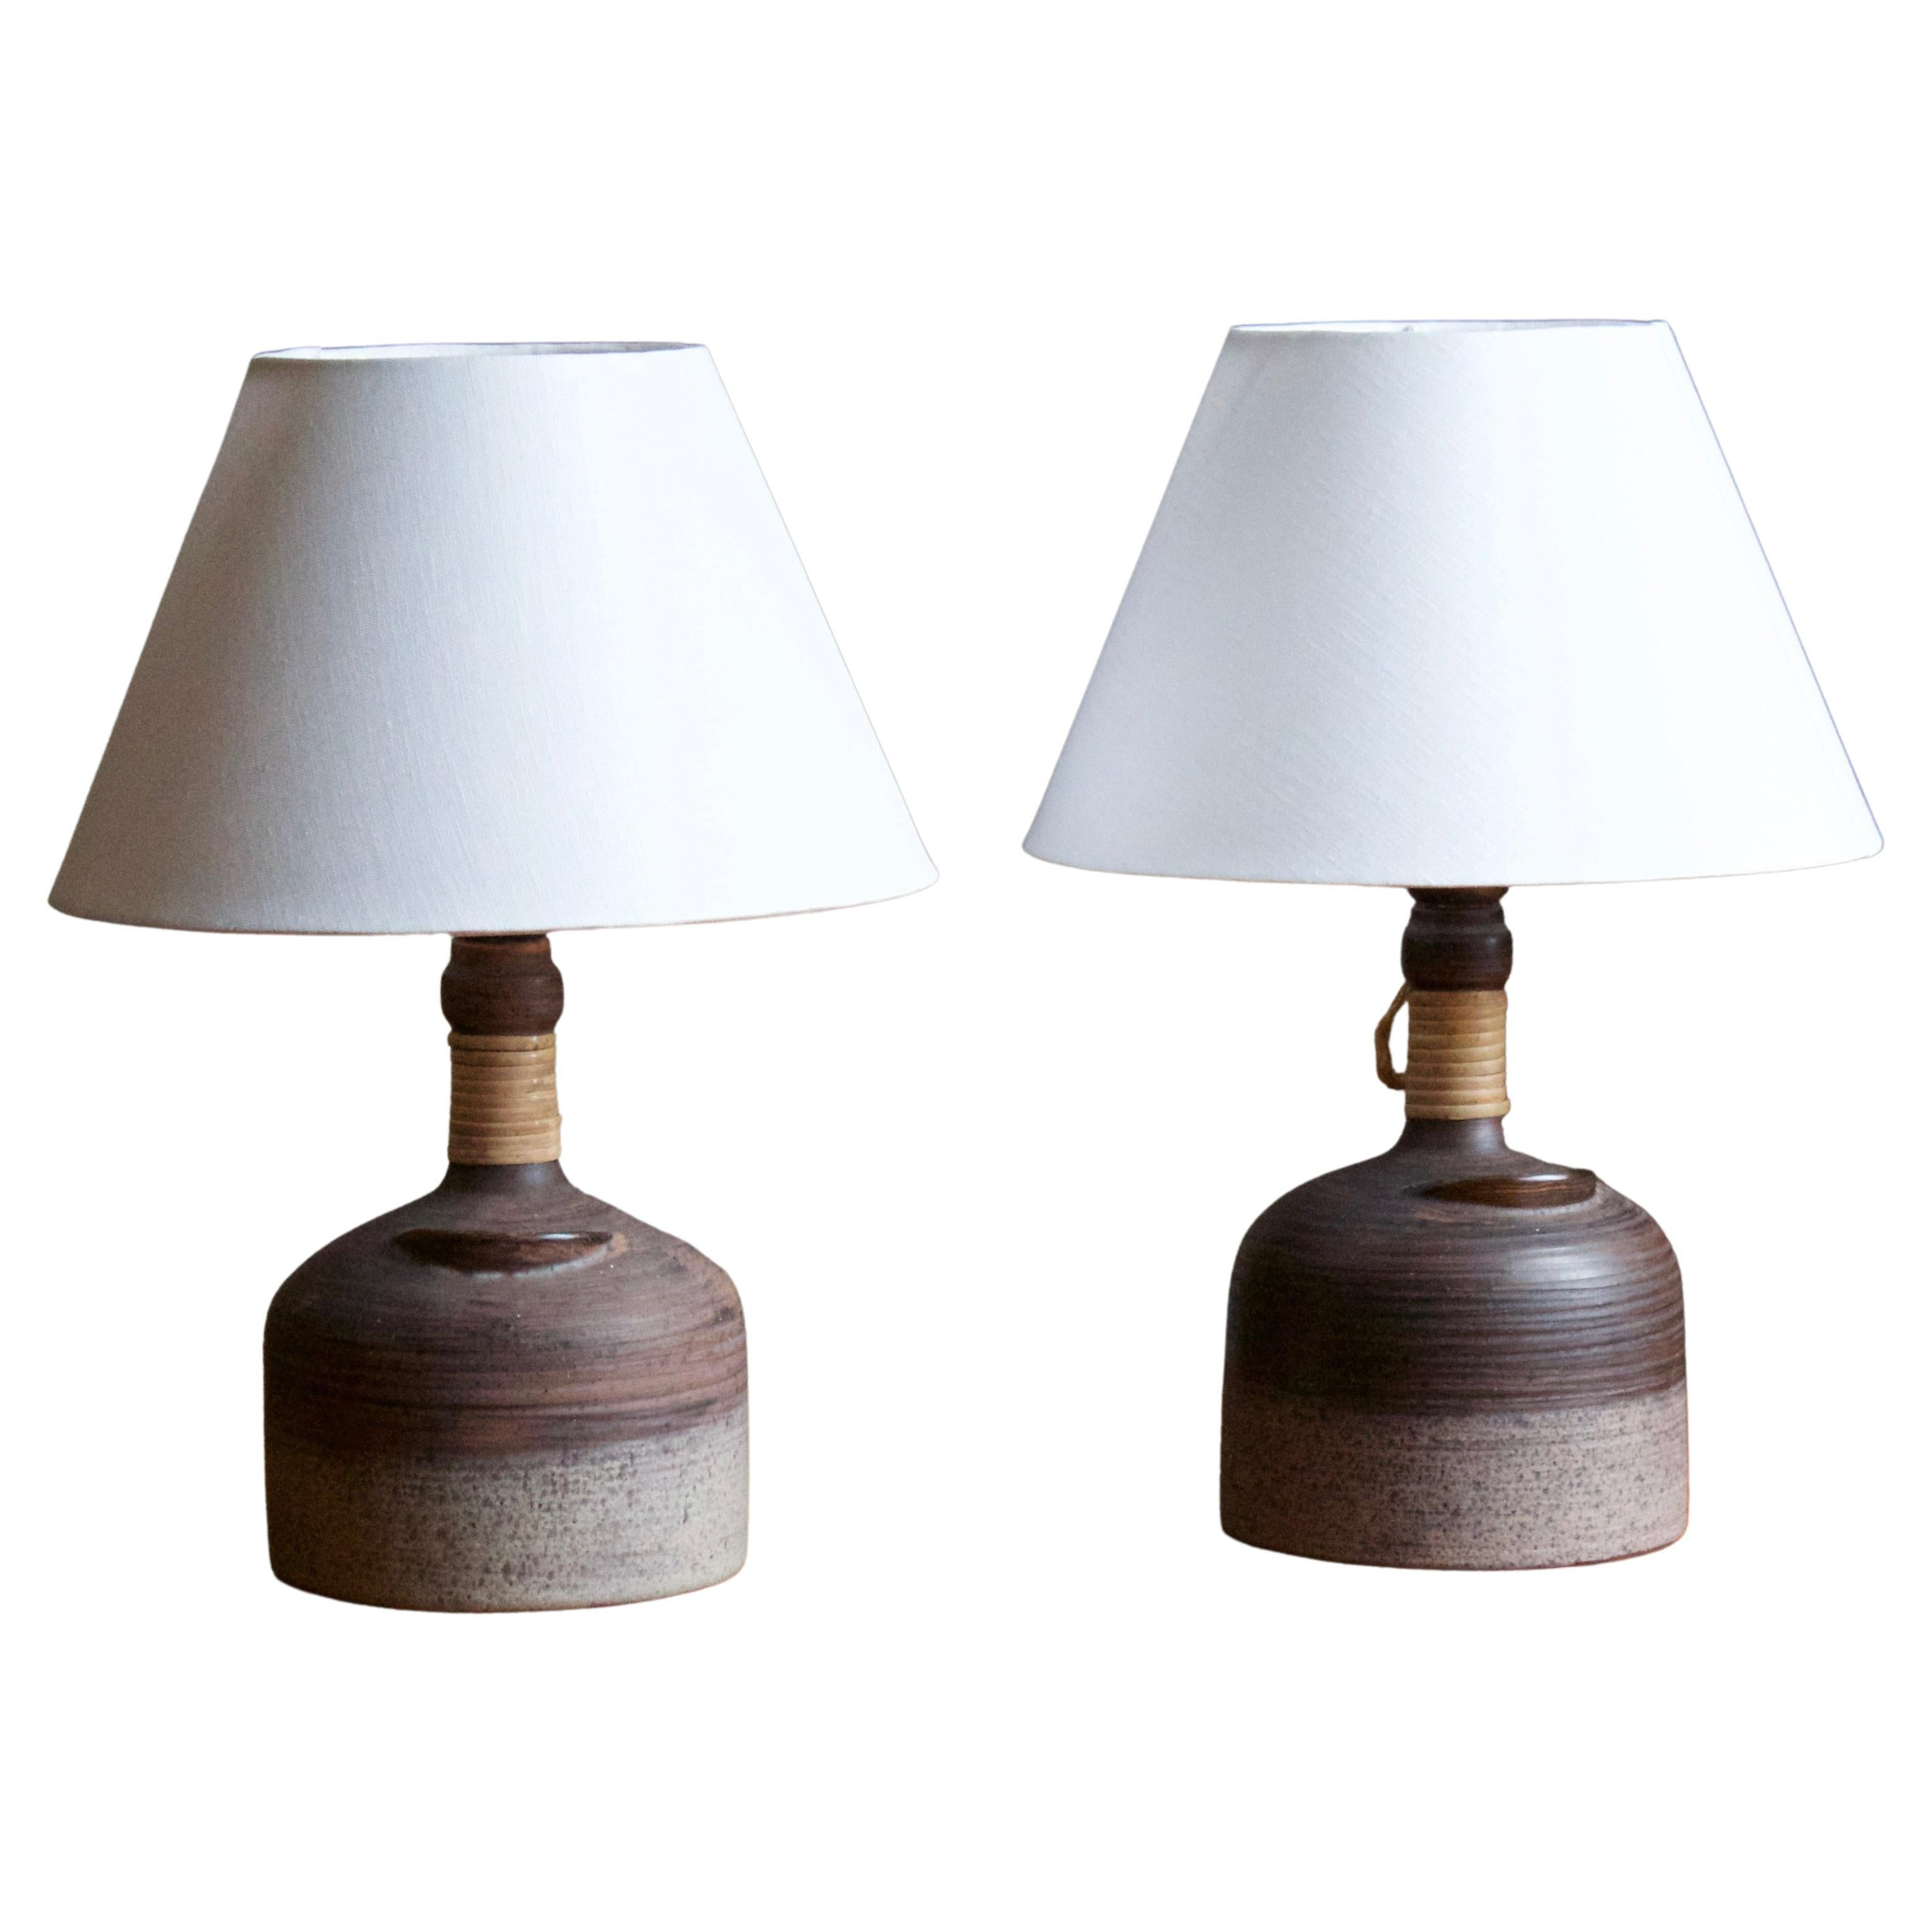 Thomas Hellström, Table Lamps, Ceramic, Rattan, Brass Nittsjö, Sweden, 1960s